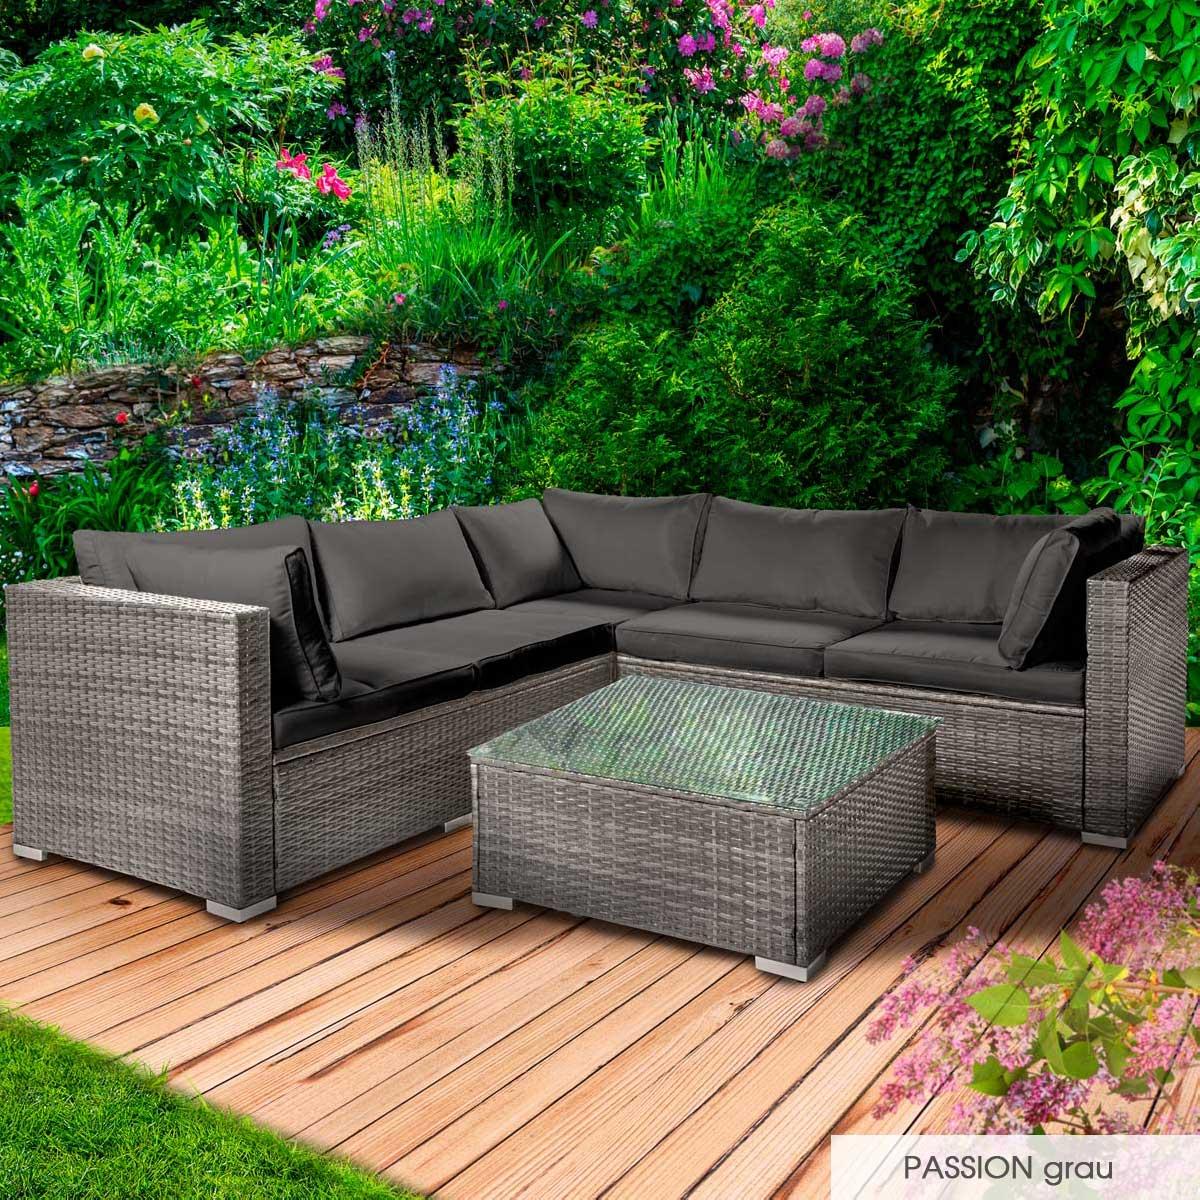 Gartenmoebel-Poly-Rattan-Lounge-Moebel-Sitzgarnitur-Gartengarnitur-Sitzgruppe-Sofa Indexbild 21